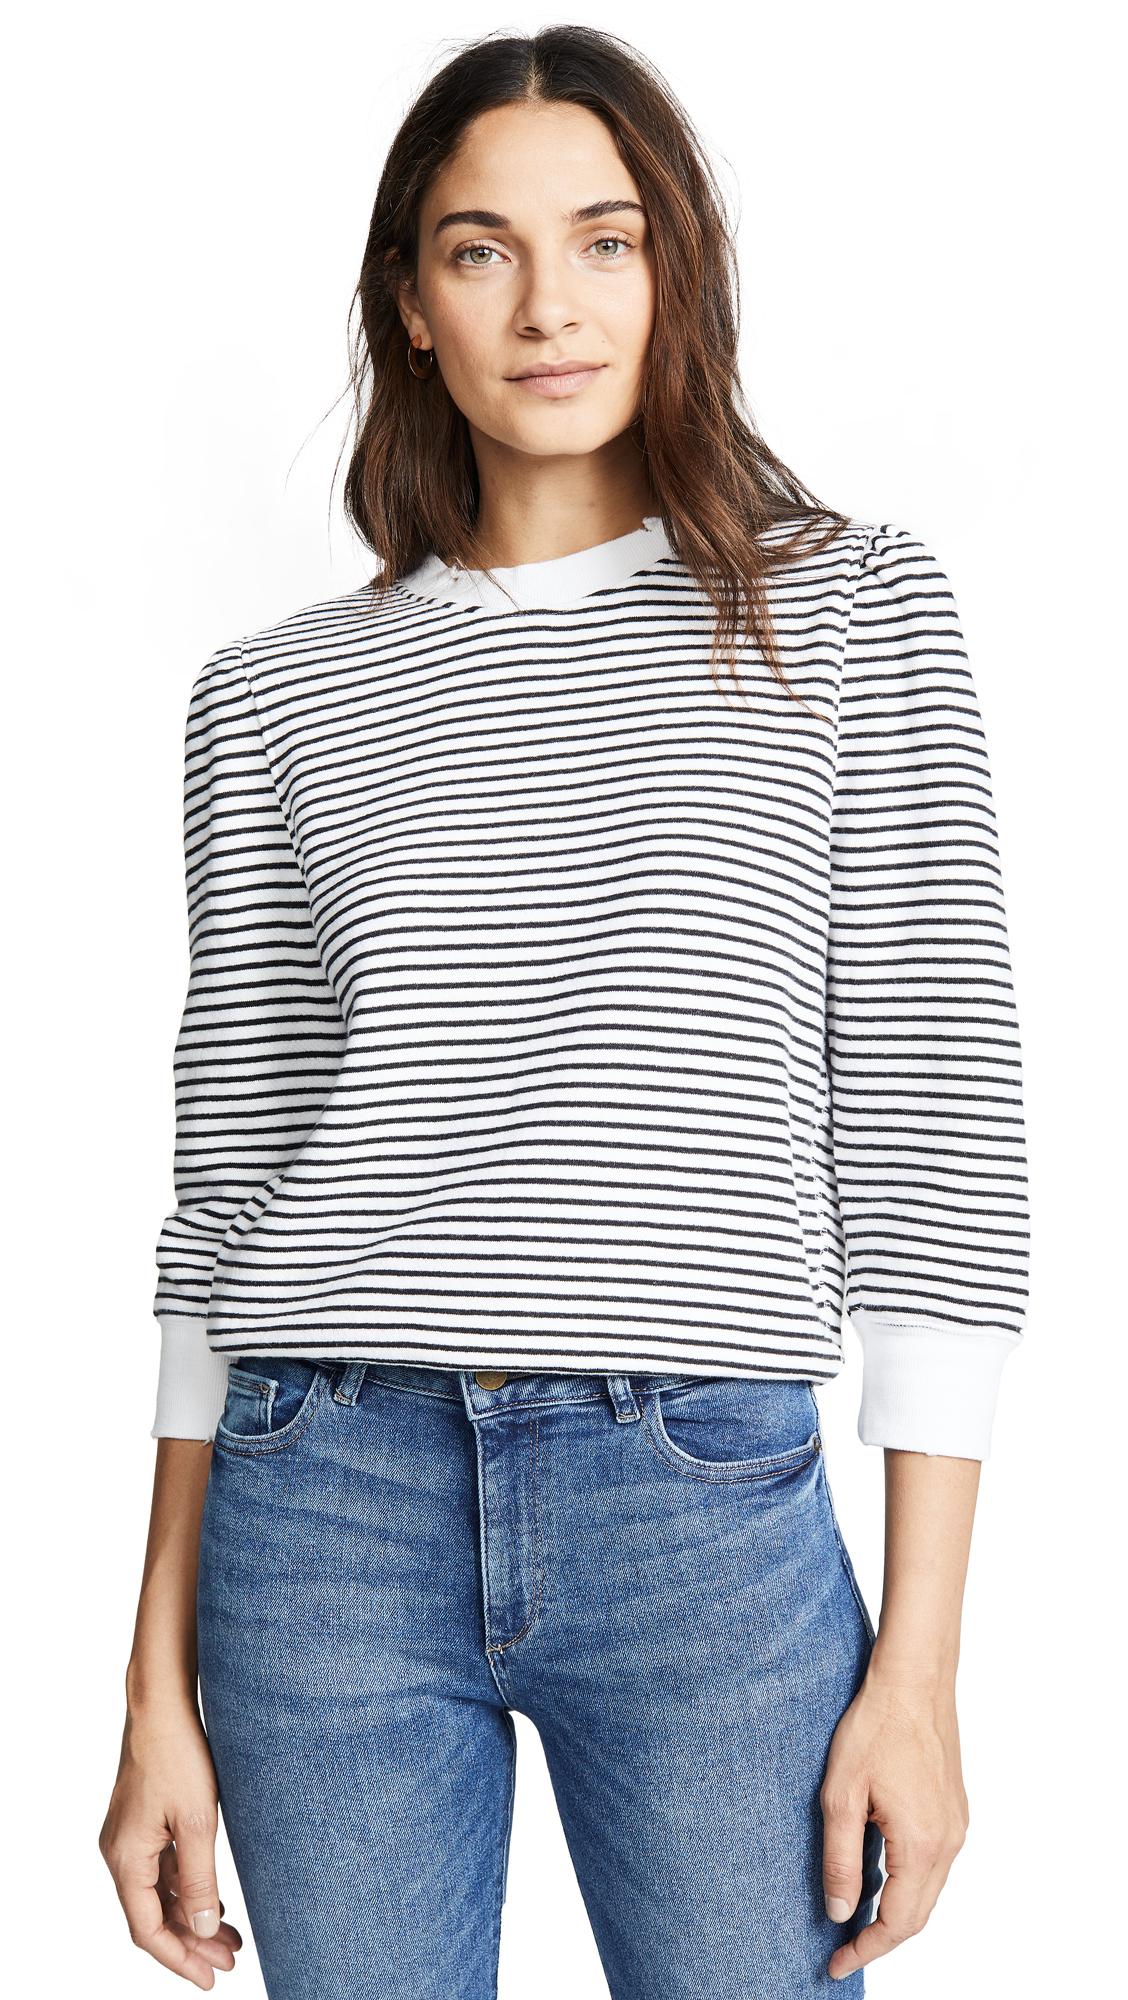 David Lerner Striped Puff Shoulder Sweatshirt In Black/White Stripe